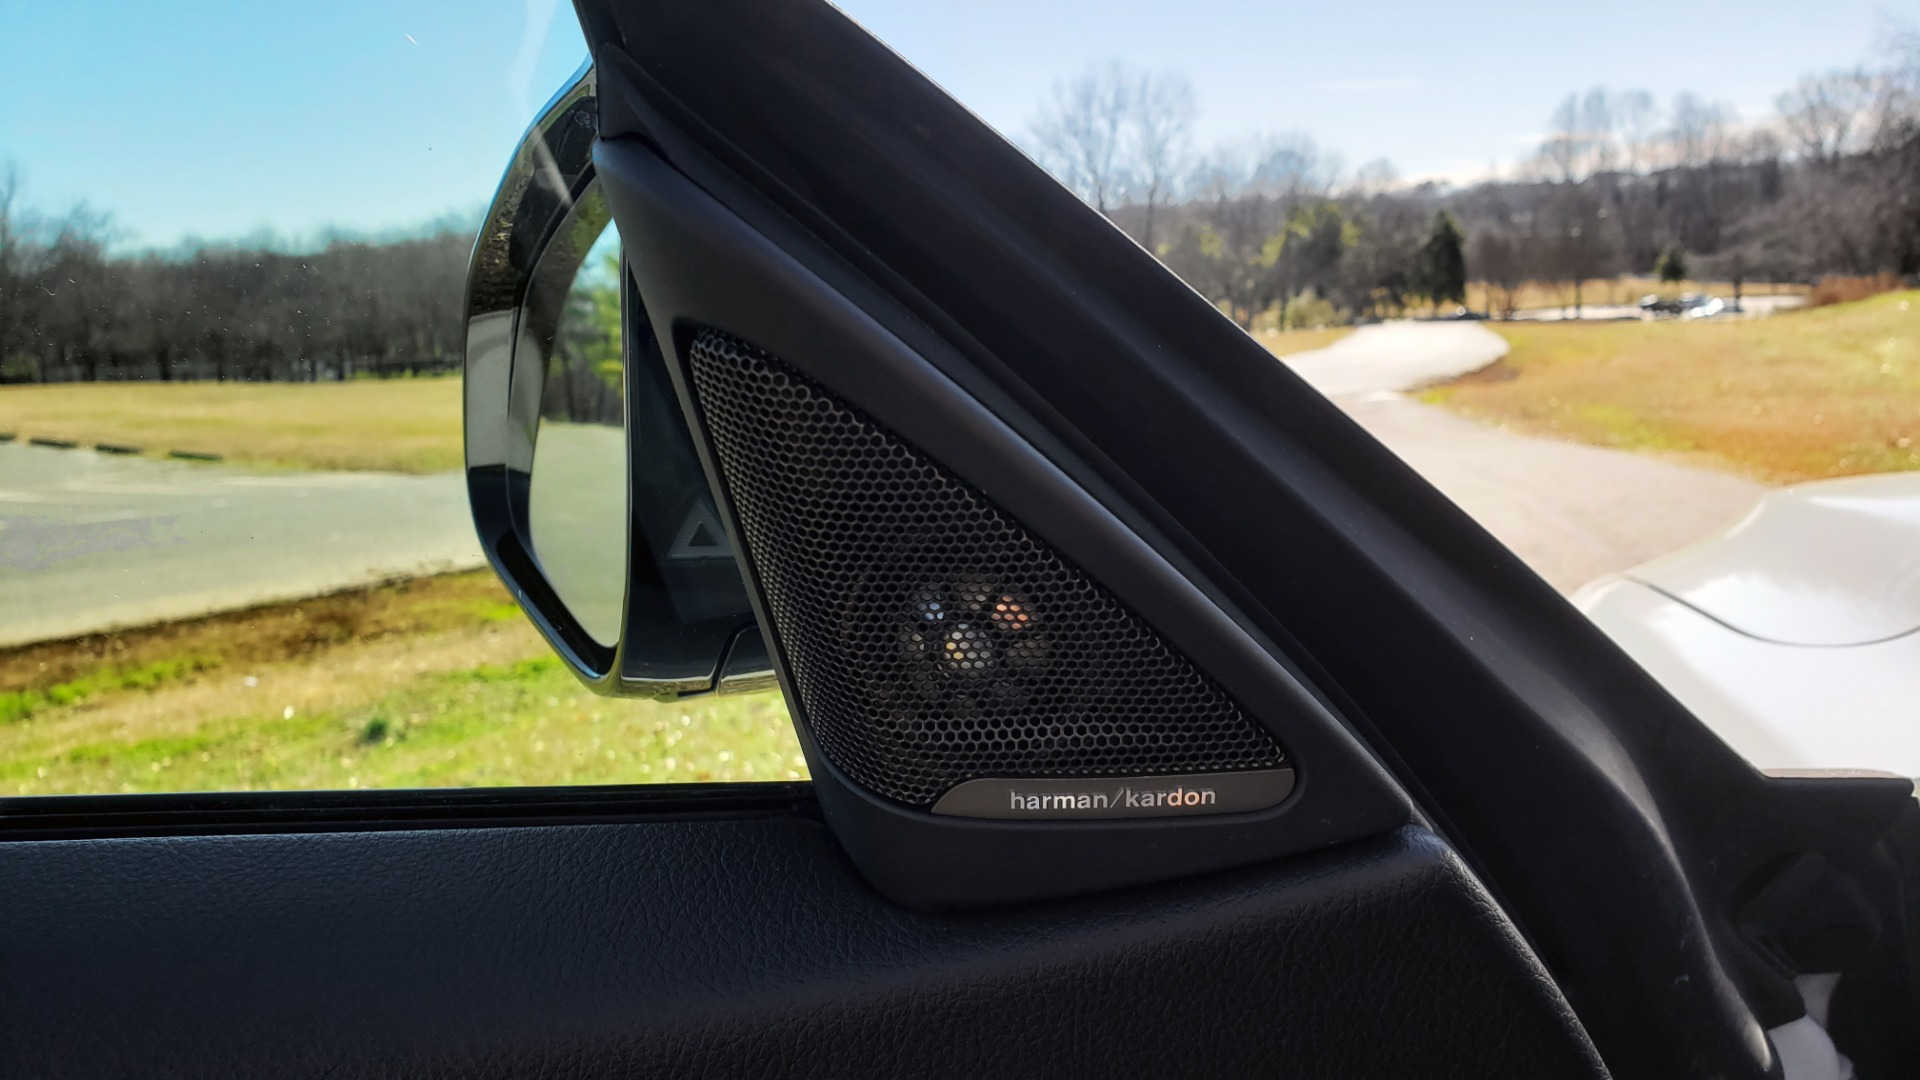 Used 2018 BMW M4 COMP PKG / EXEC / M-DRIVER / PARK CNTRL / ACTIVE BLIND SPOT for sale $45,449 at Formula Imports in Charlotte NC 28227 35